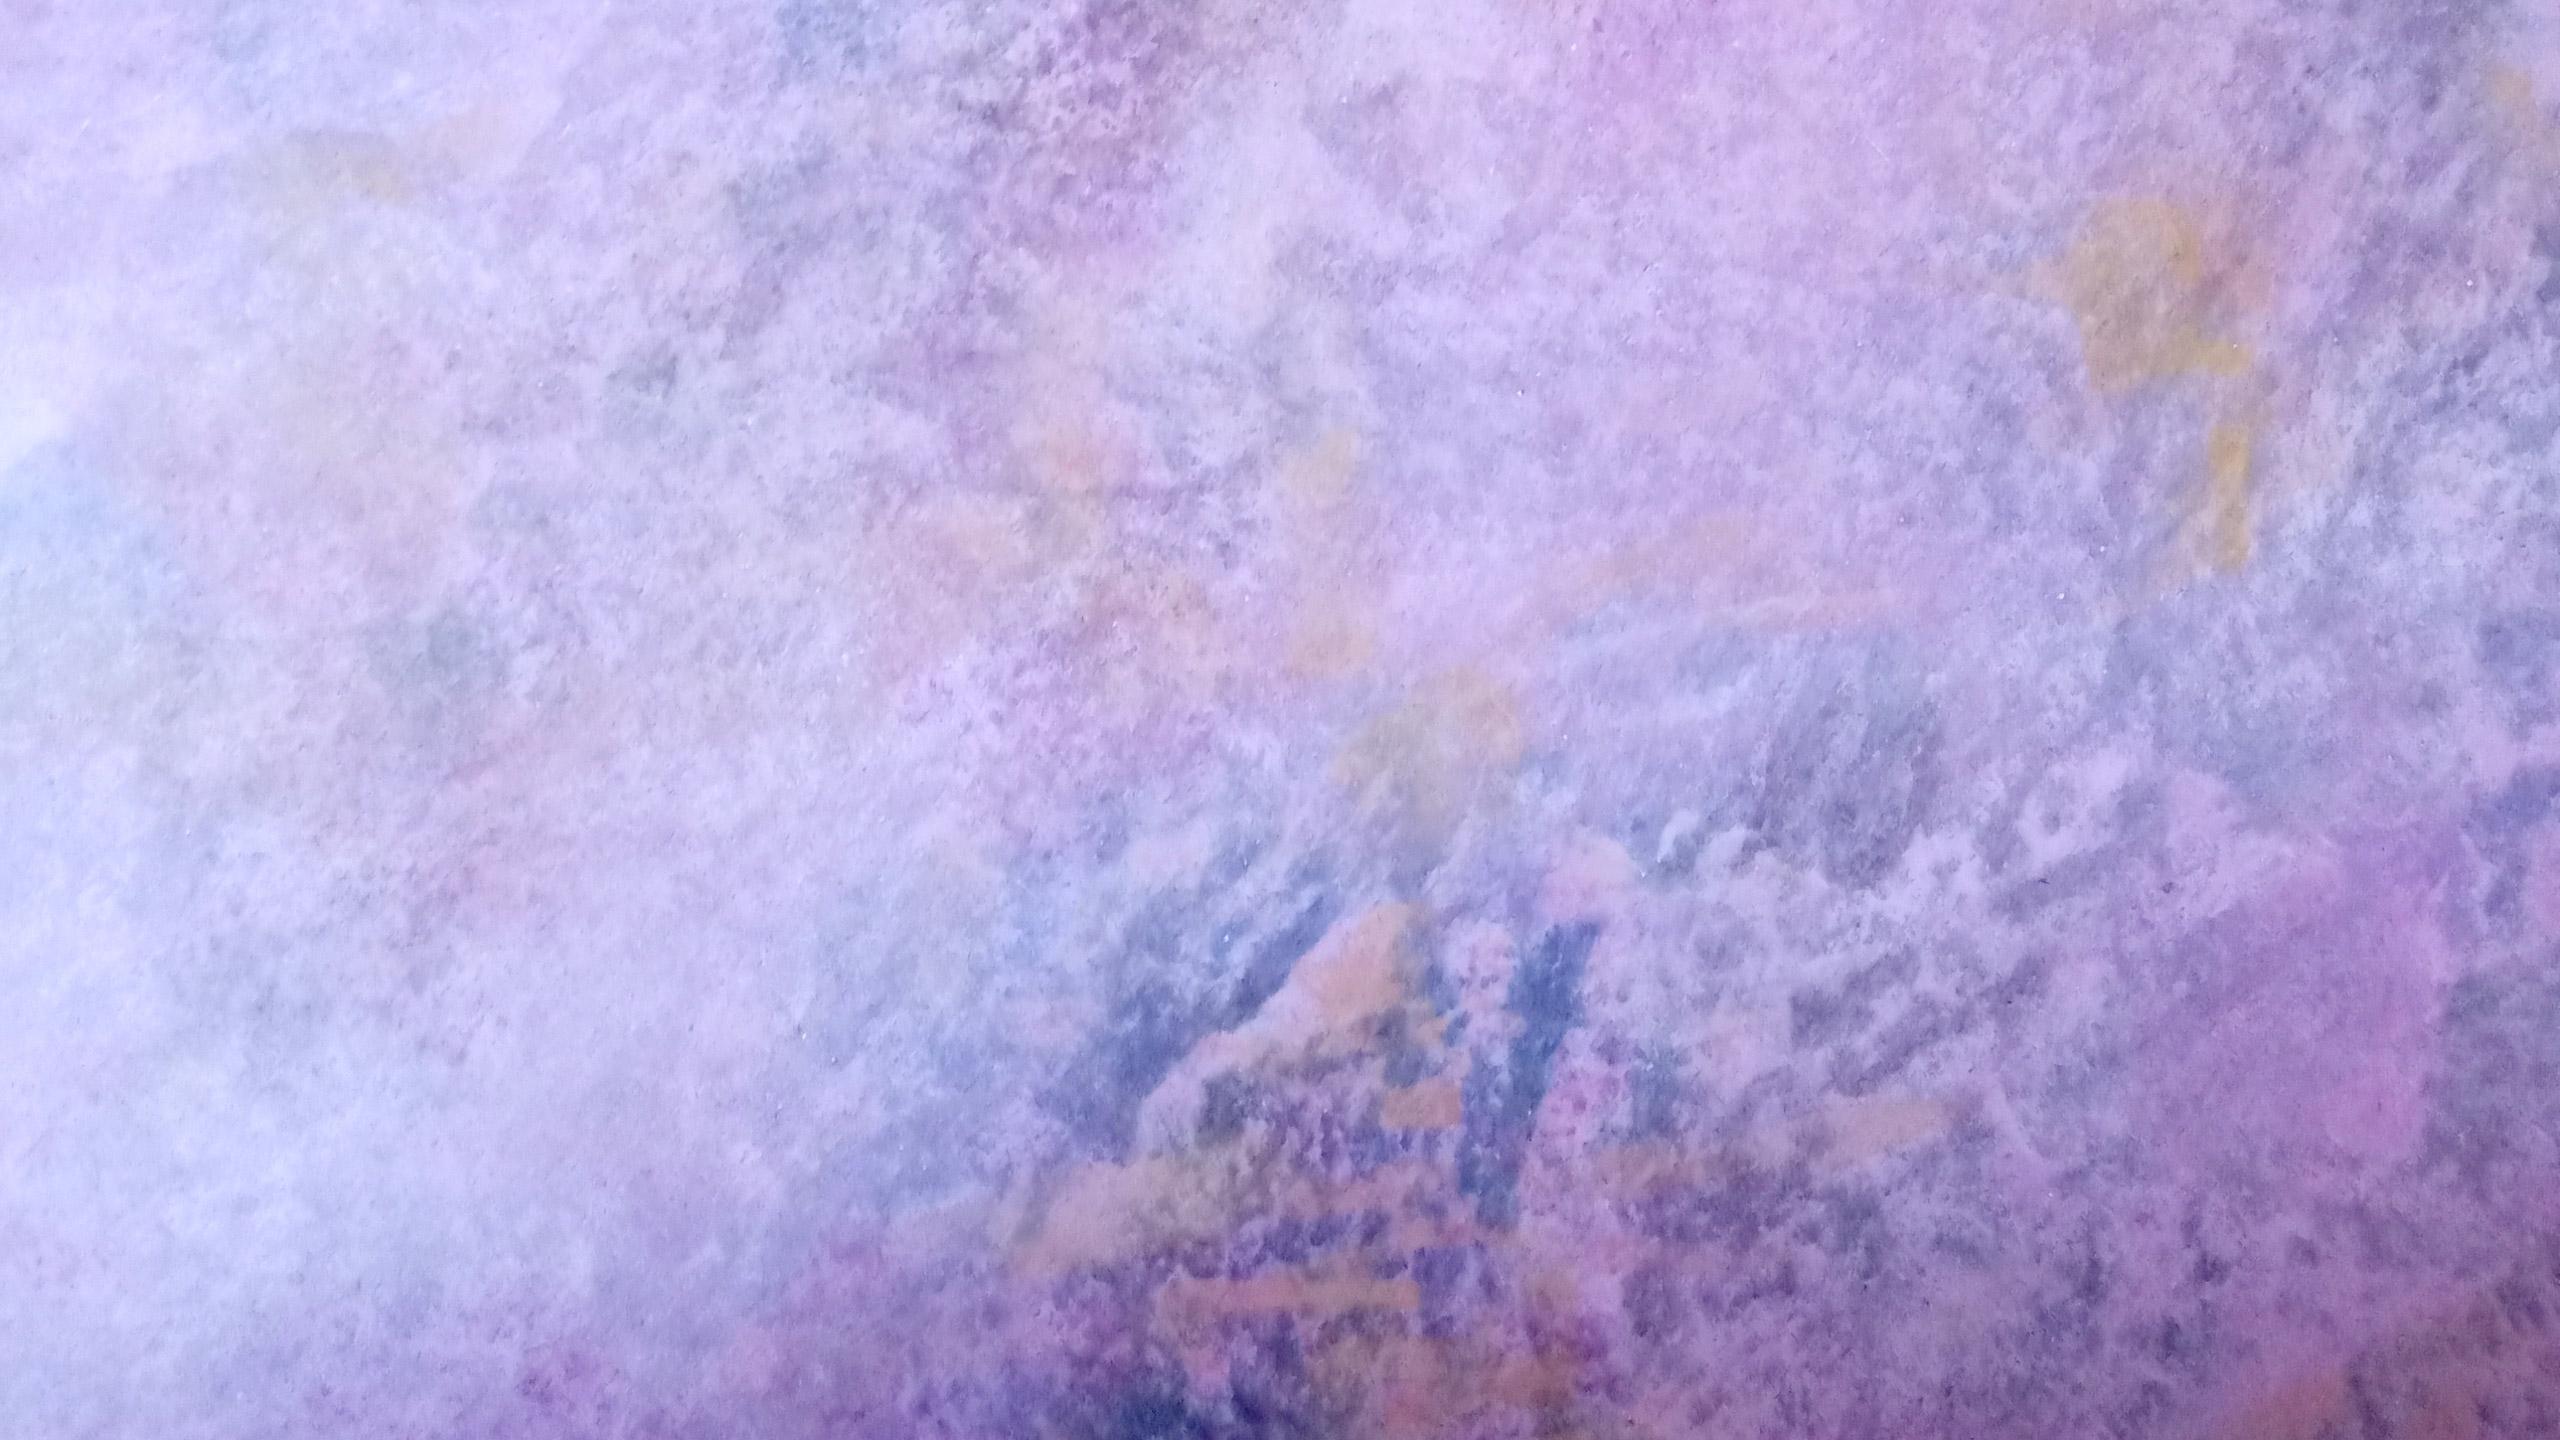 SgraffitoStucco - Doloris Meta Maze, Coloured flame and transparencies